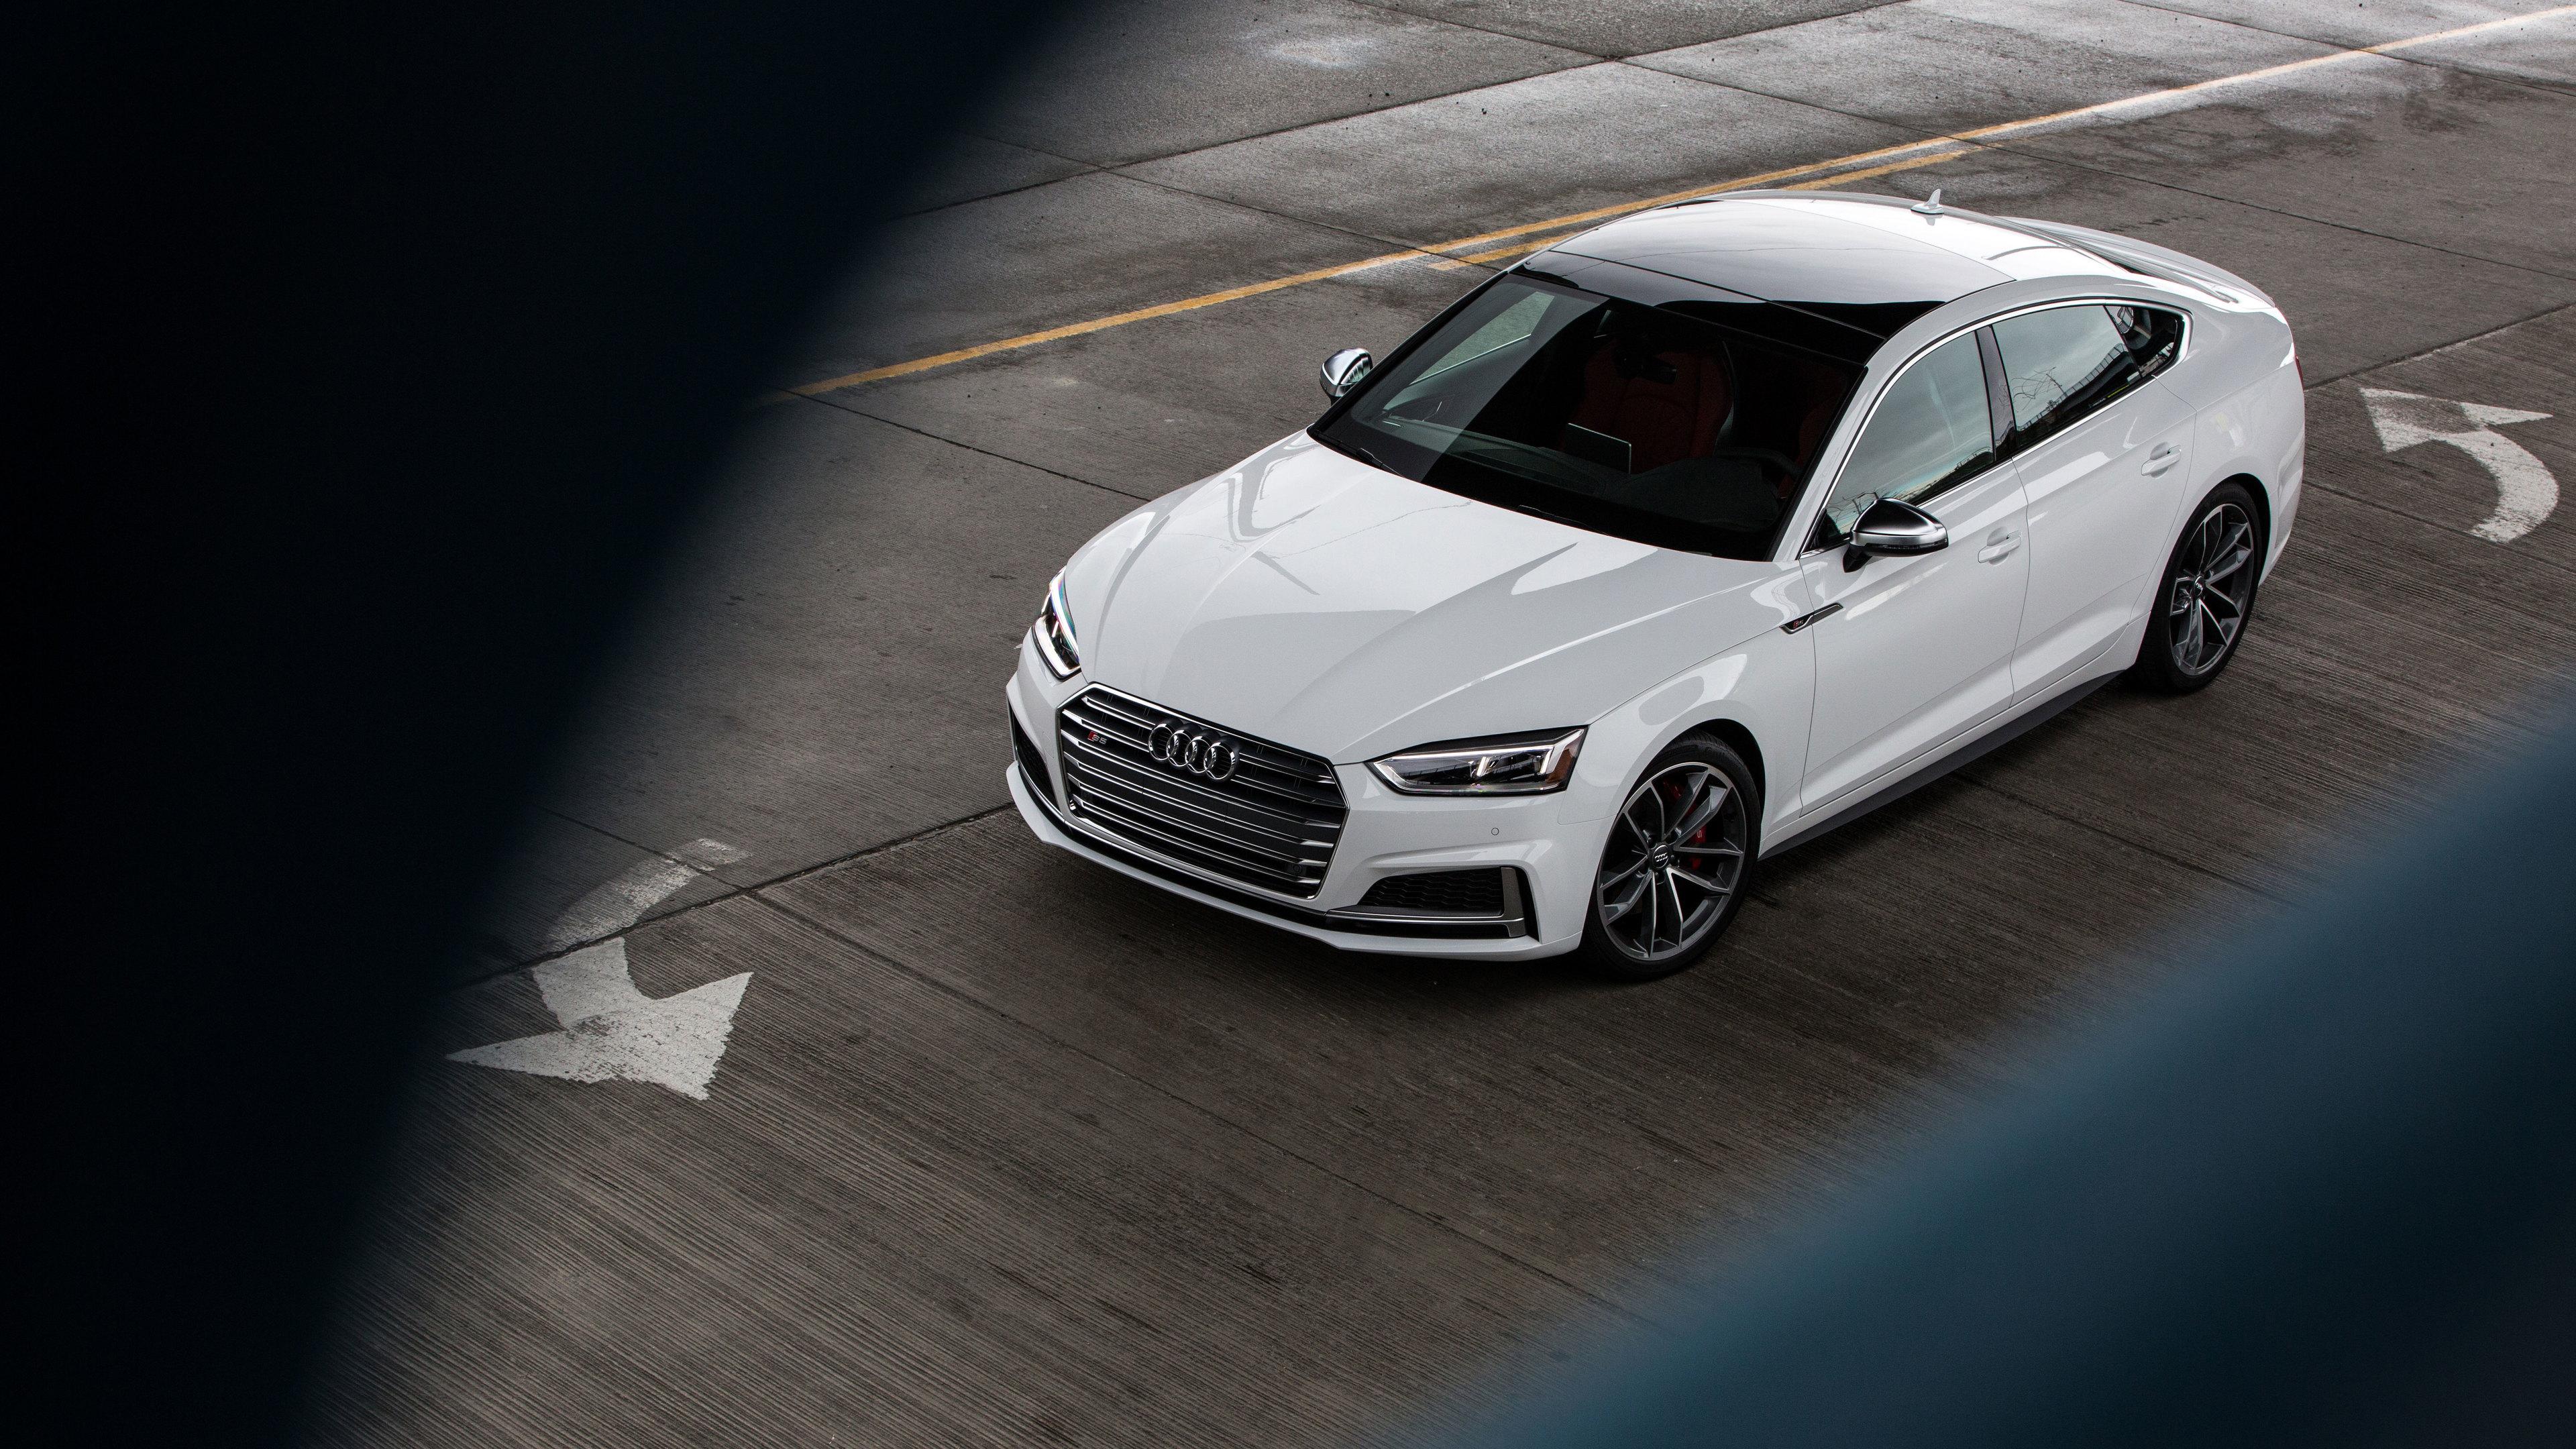 2018 audi s5 sportback 1539105471 - 2018 Audi S5 Sportback - hd-wallpapers, cars wallpapers, audi wallpapers, 5k wallpapers, 4k-wallpapers, 2018 cars wallpapers